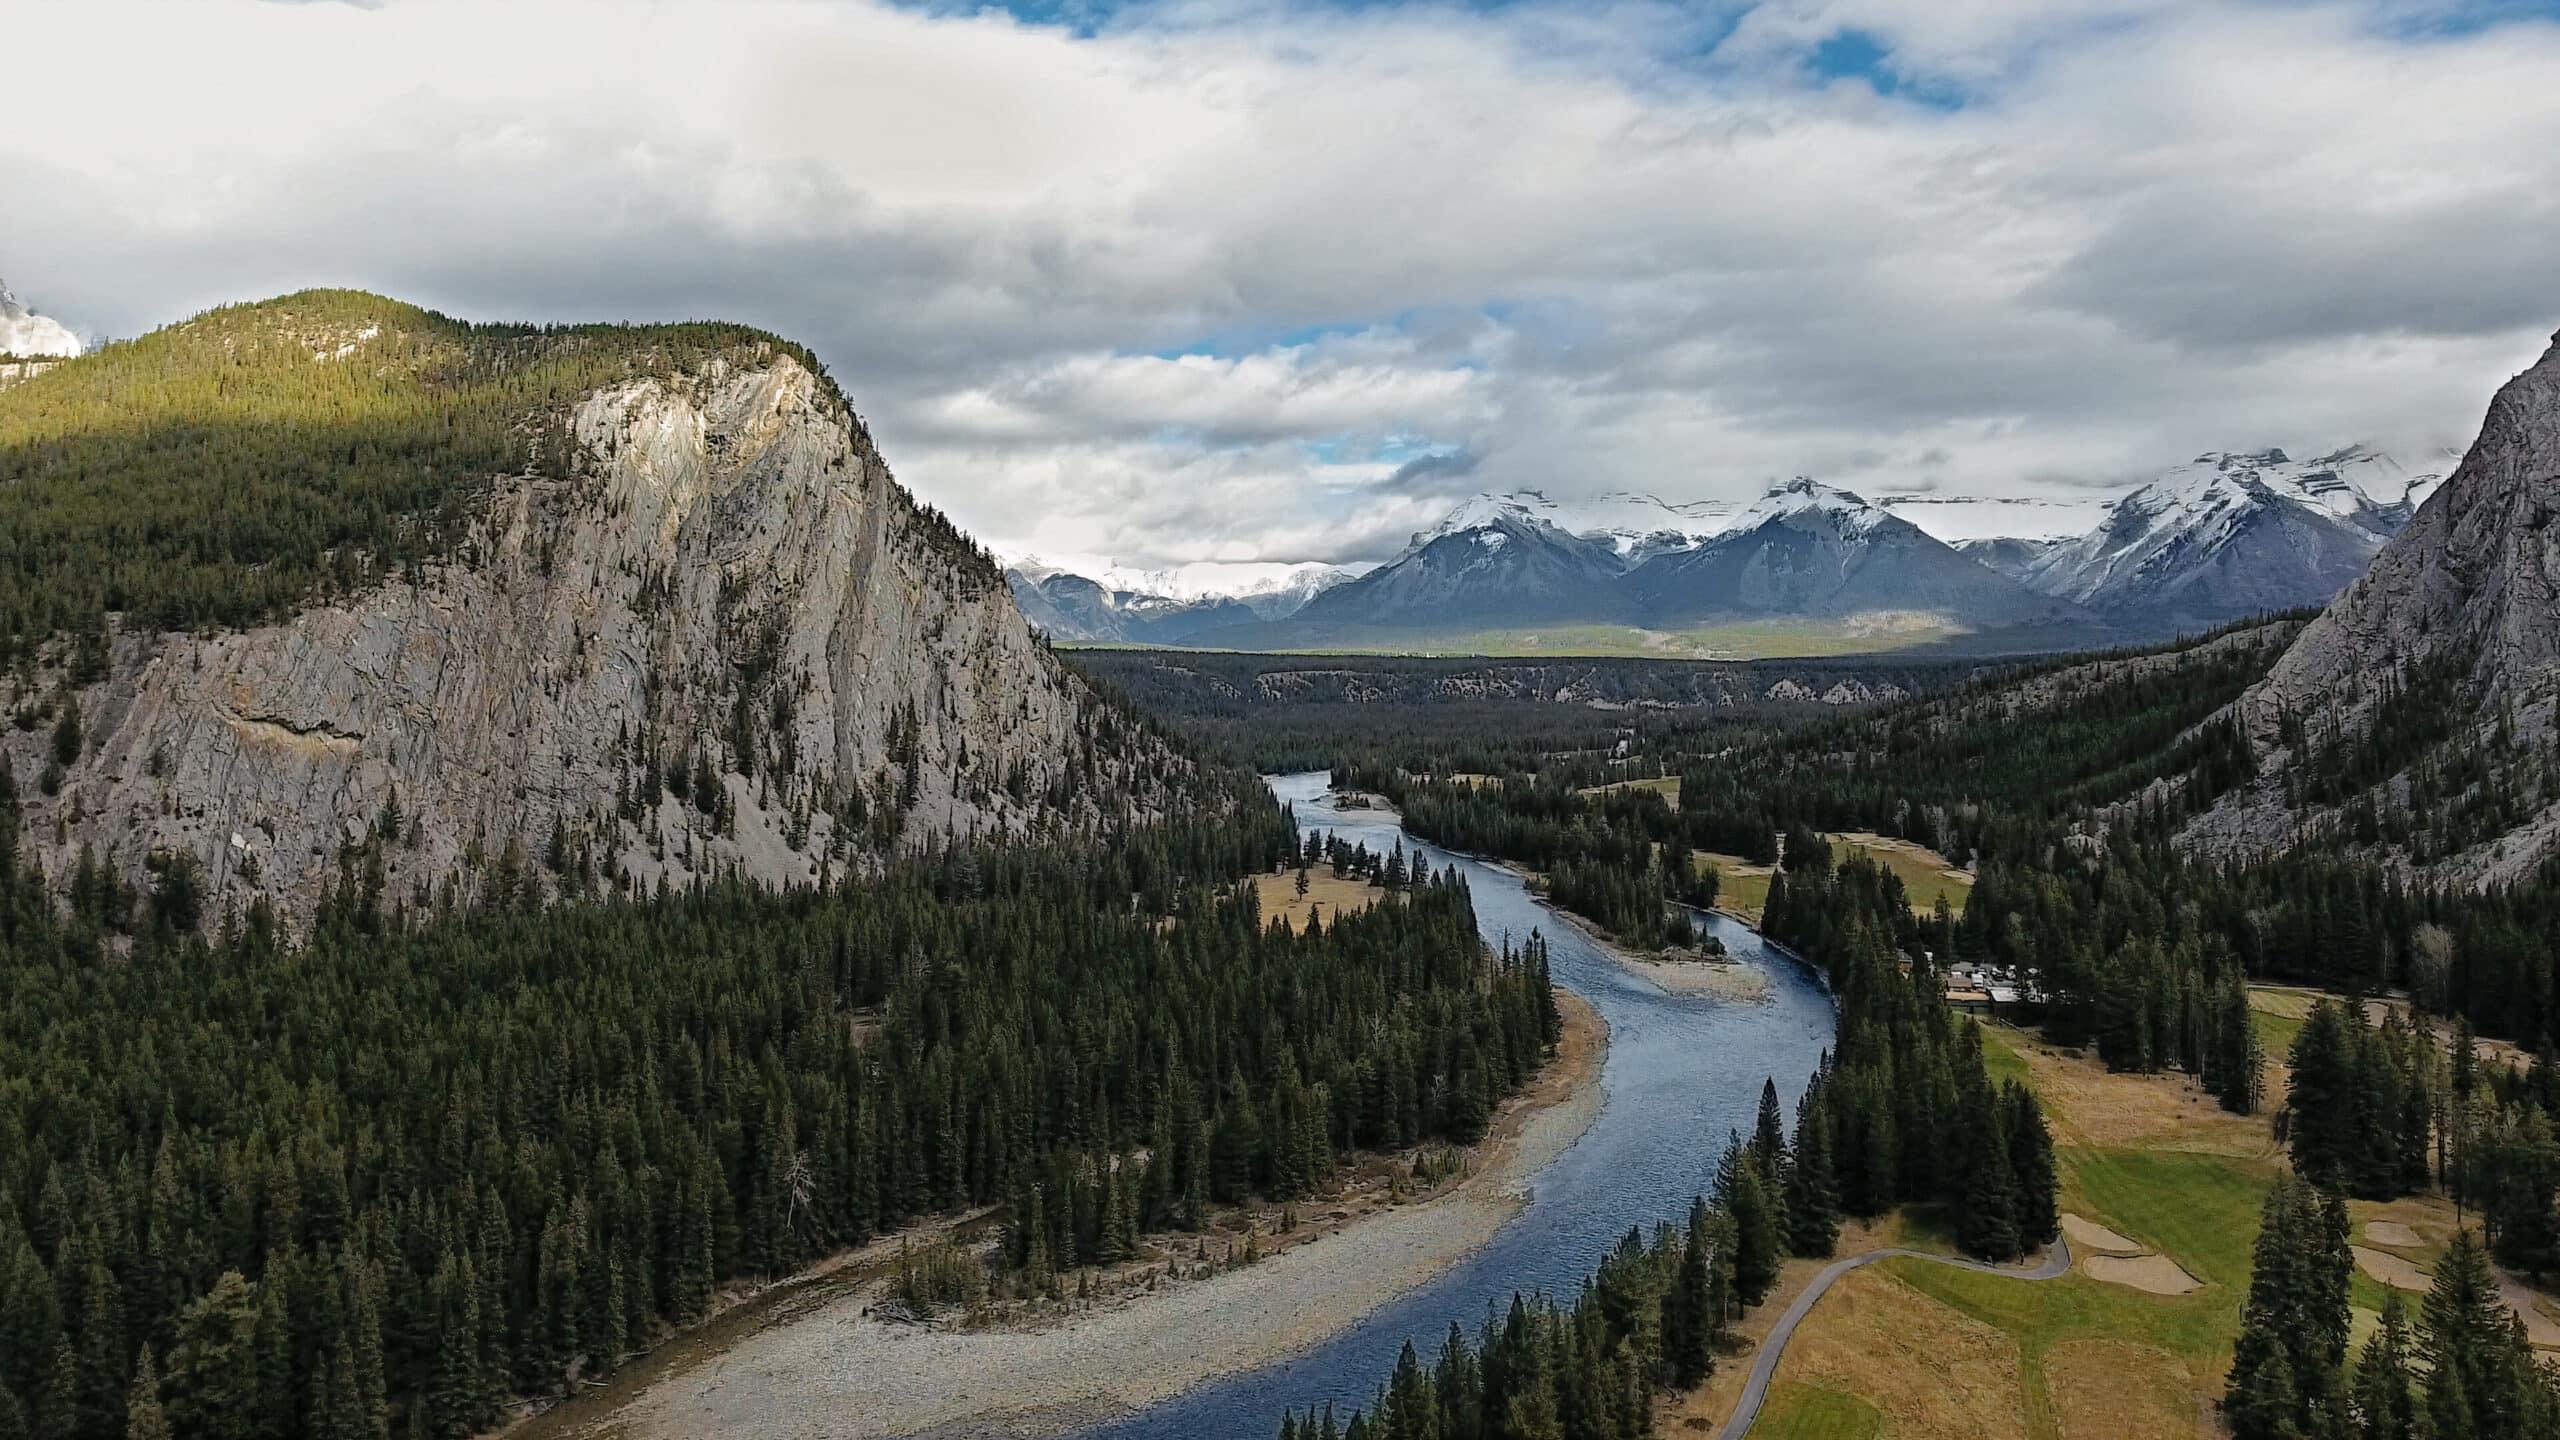 11/02/2016 – Banff